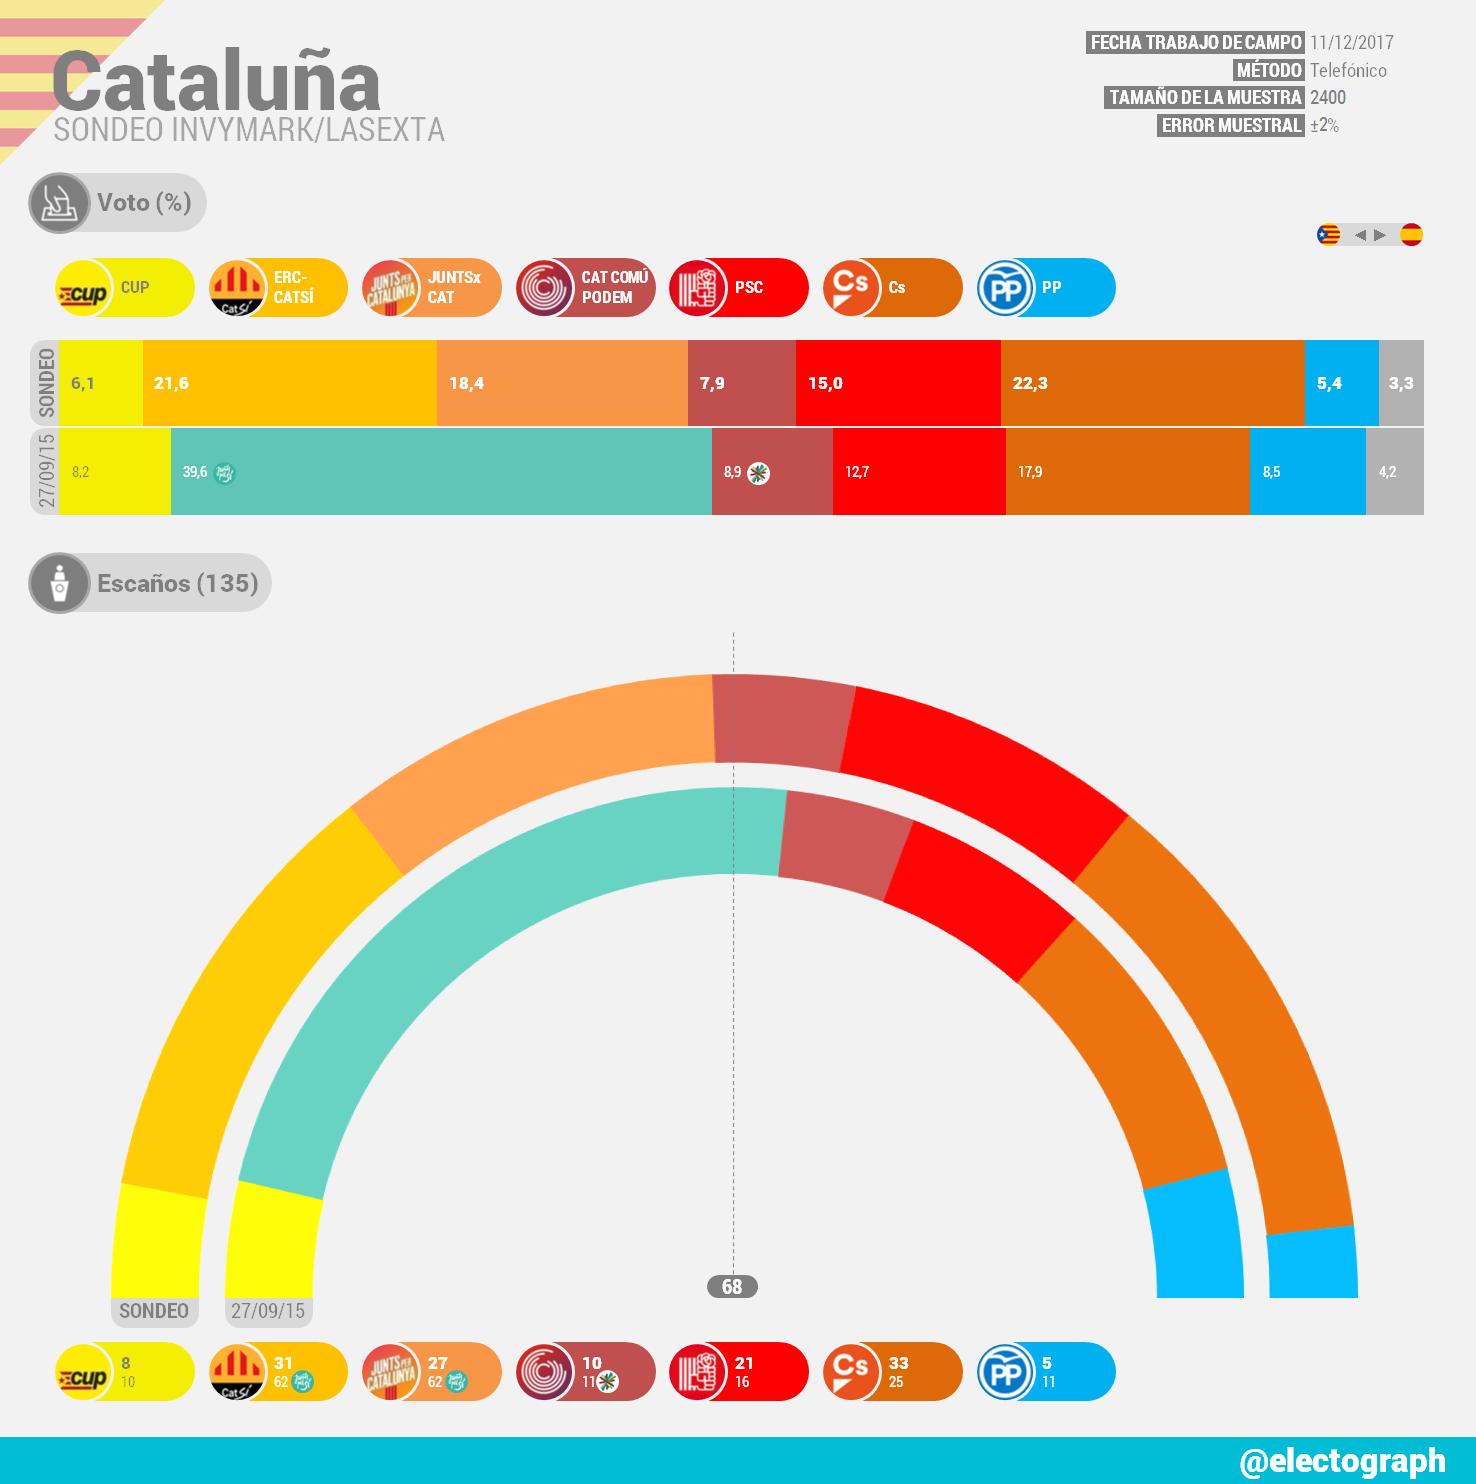 Encuestas para Cataluña - Página 2 CAT_171215_Invymark